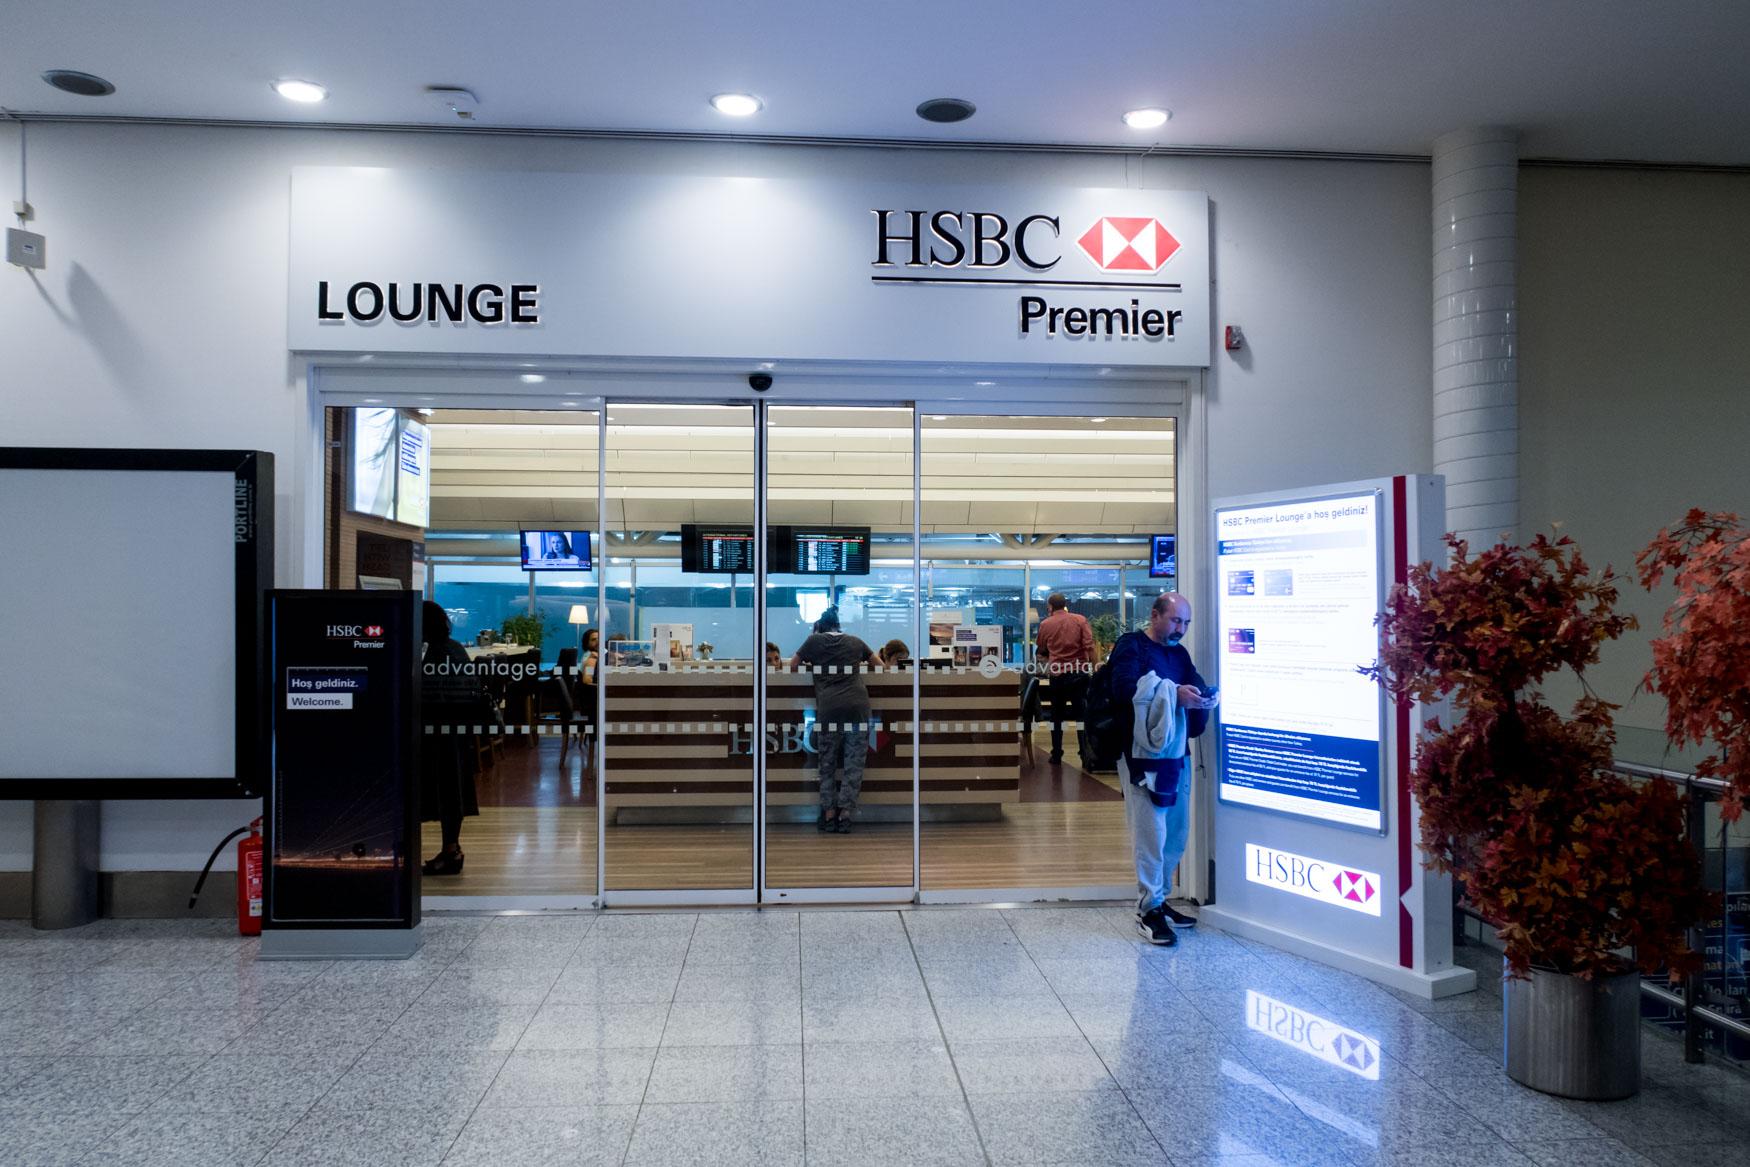 HSBC Premier Lounge at Istanbul Ataturk Airport